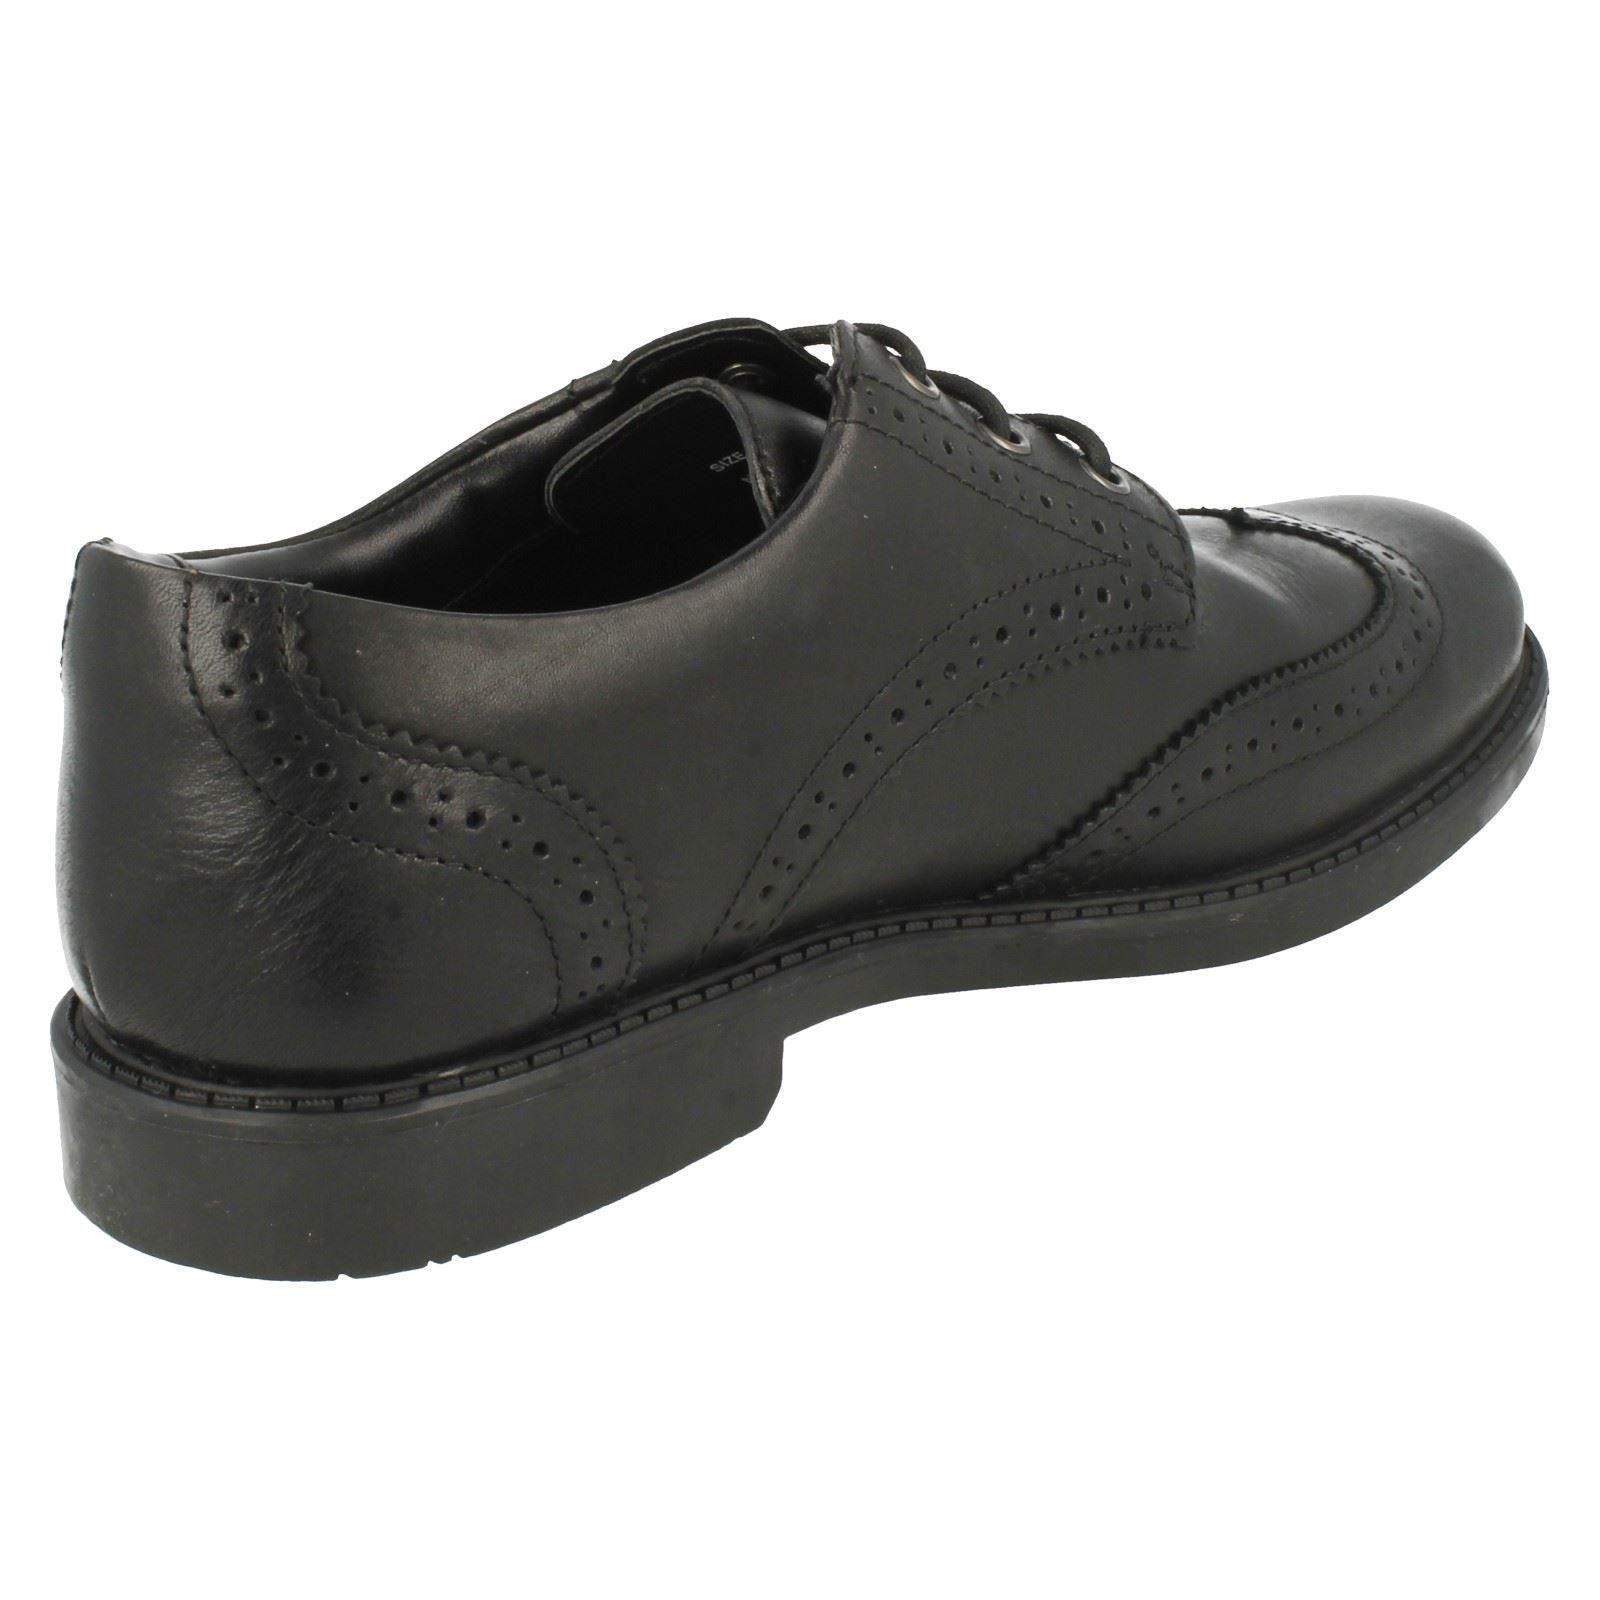 Boys G Fitting School Shoes